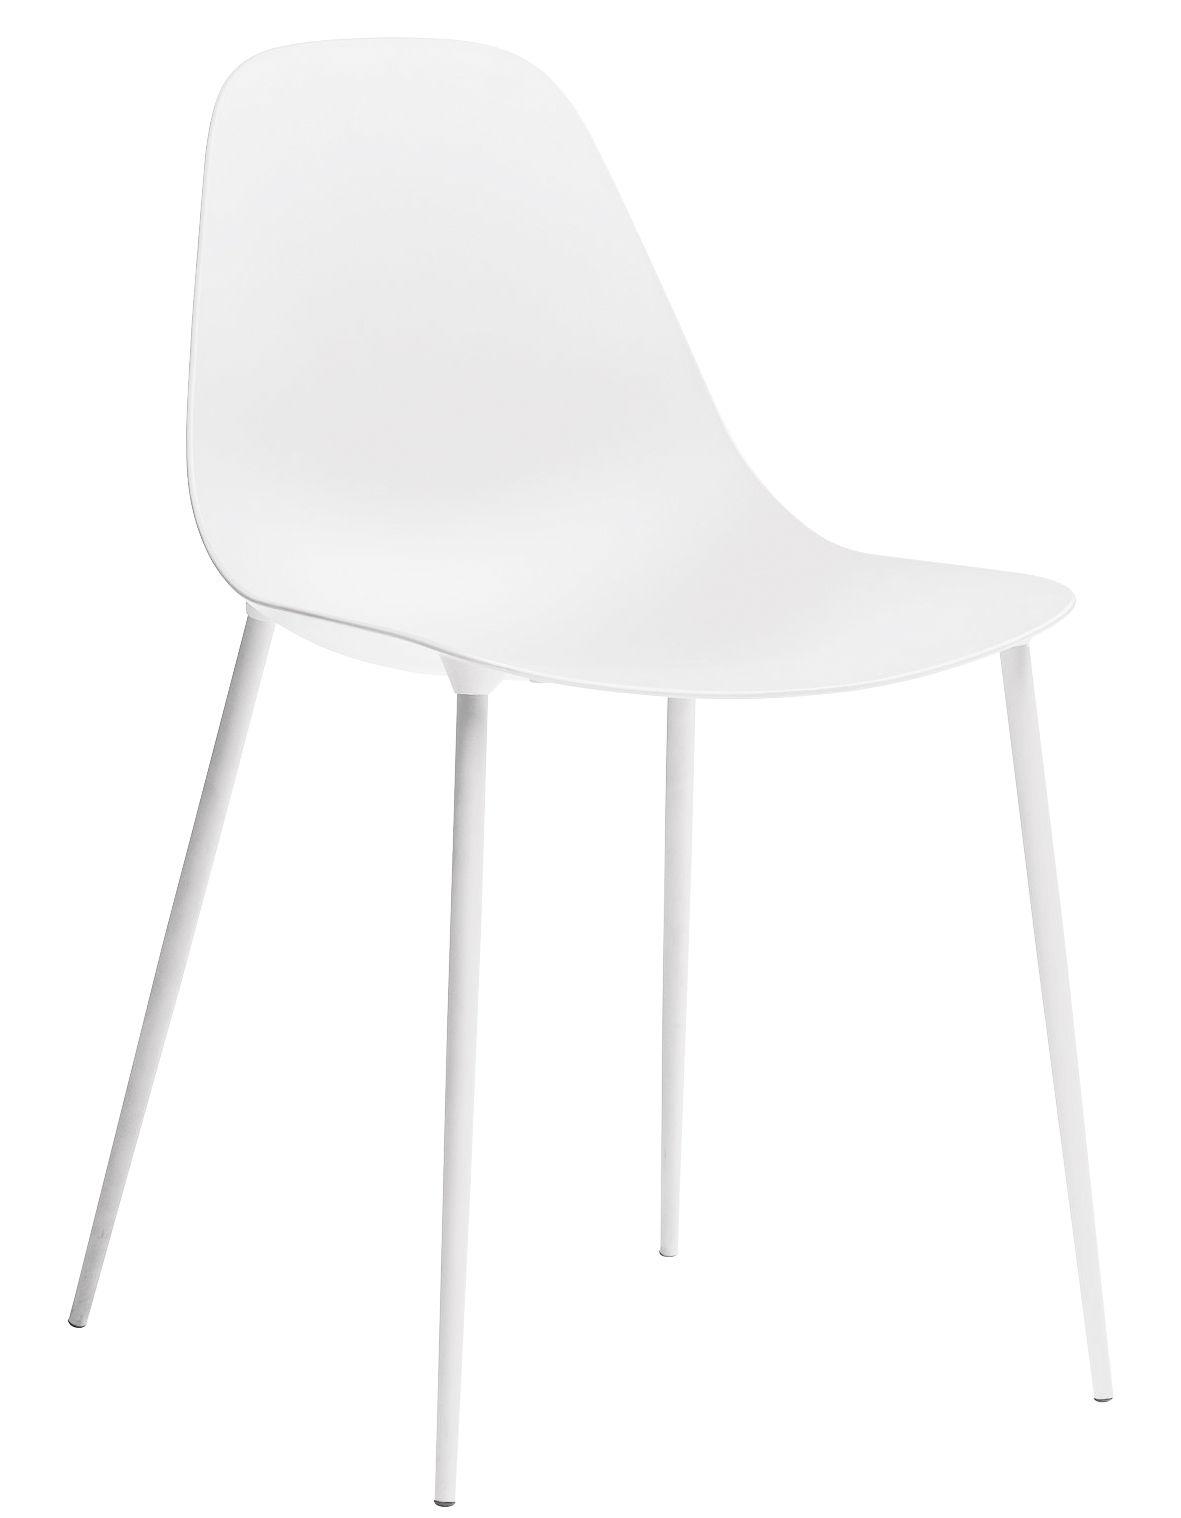 Möbel - Stühle  - Mammamia Stuhl / Sitzschale & Stuhlbeine Metall - Opinion Ciatti - Weiß - Aluminium, Metall